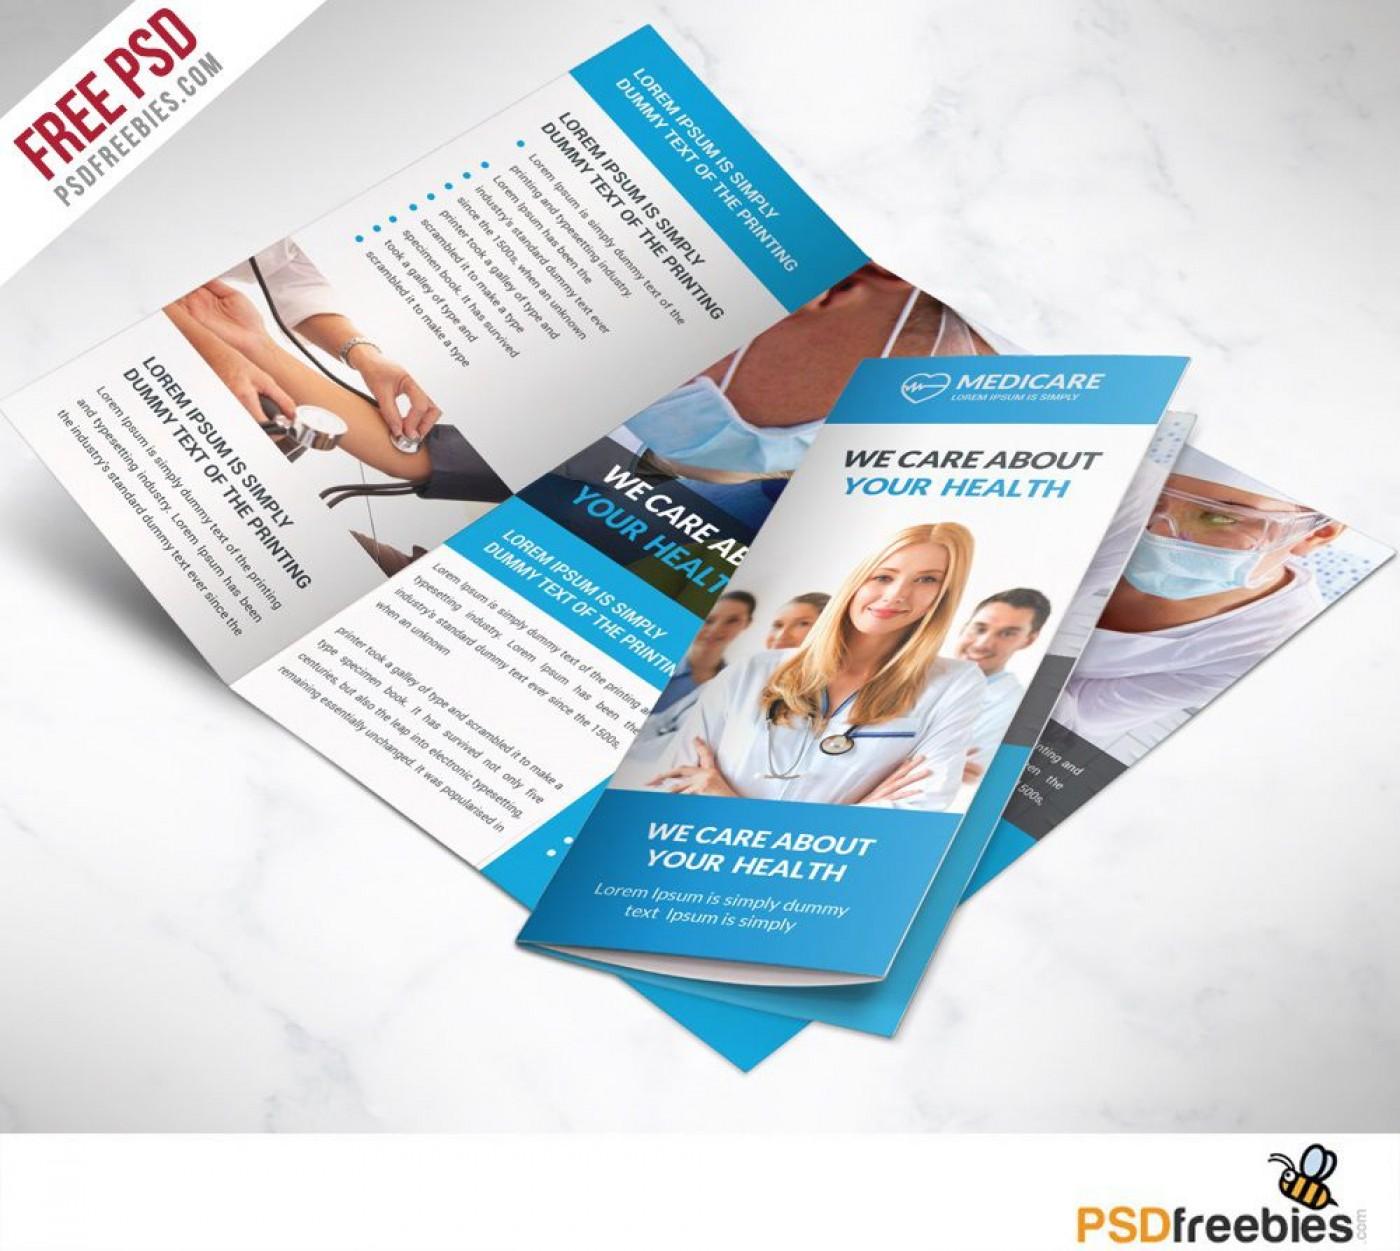 007 Unforgettable Photoshop Brochure Design Template Free Download High Def 1400